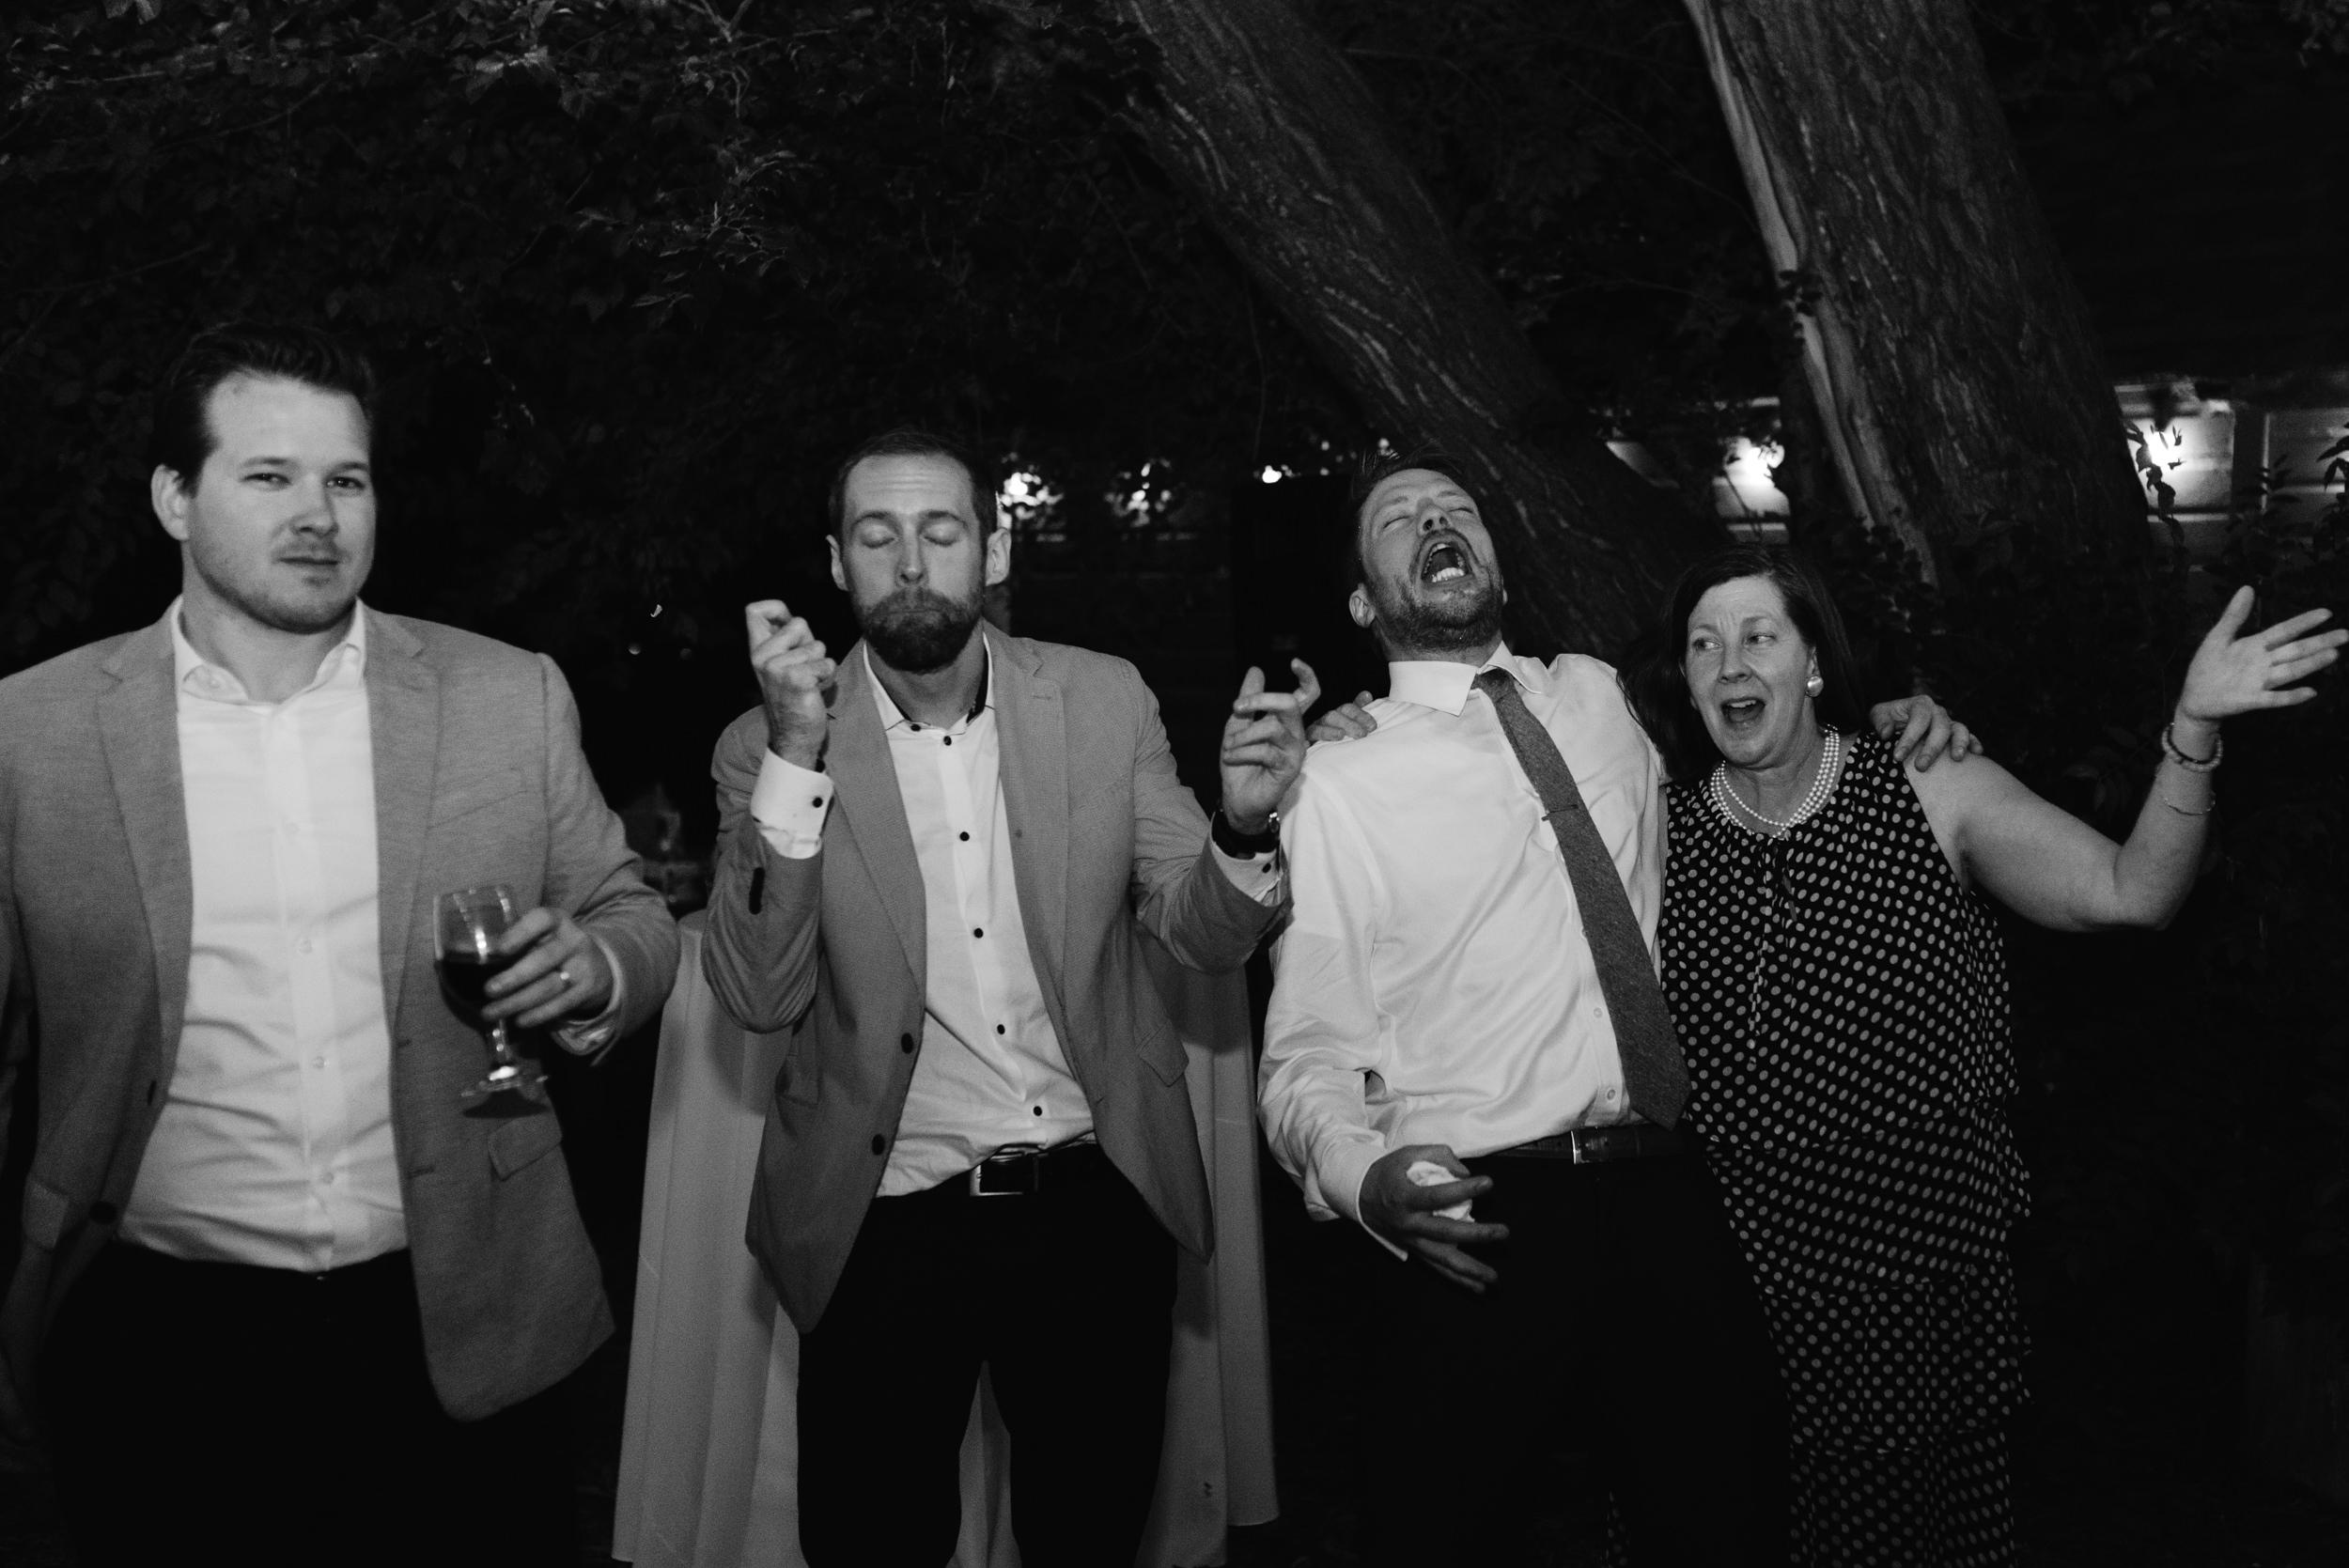 Three Leaf Farm wedding in Boulder, Colorado. Denver based elopement and wedding photographer.